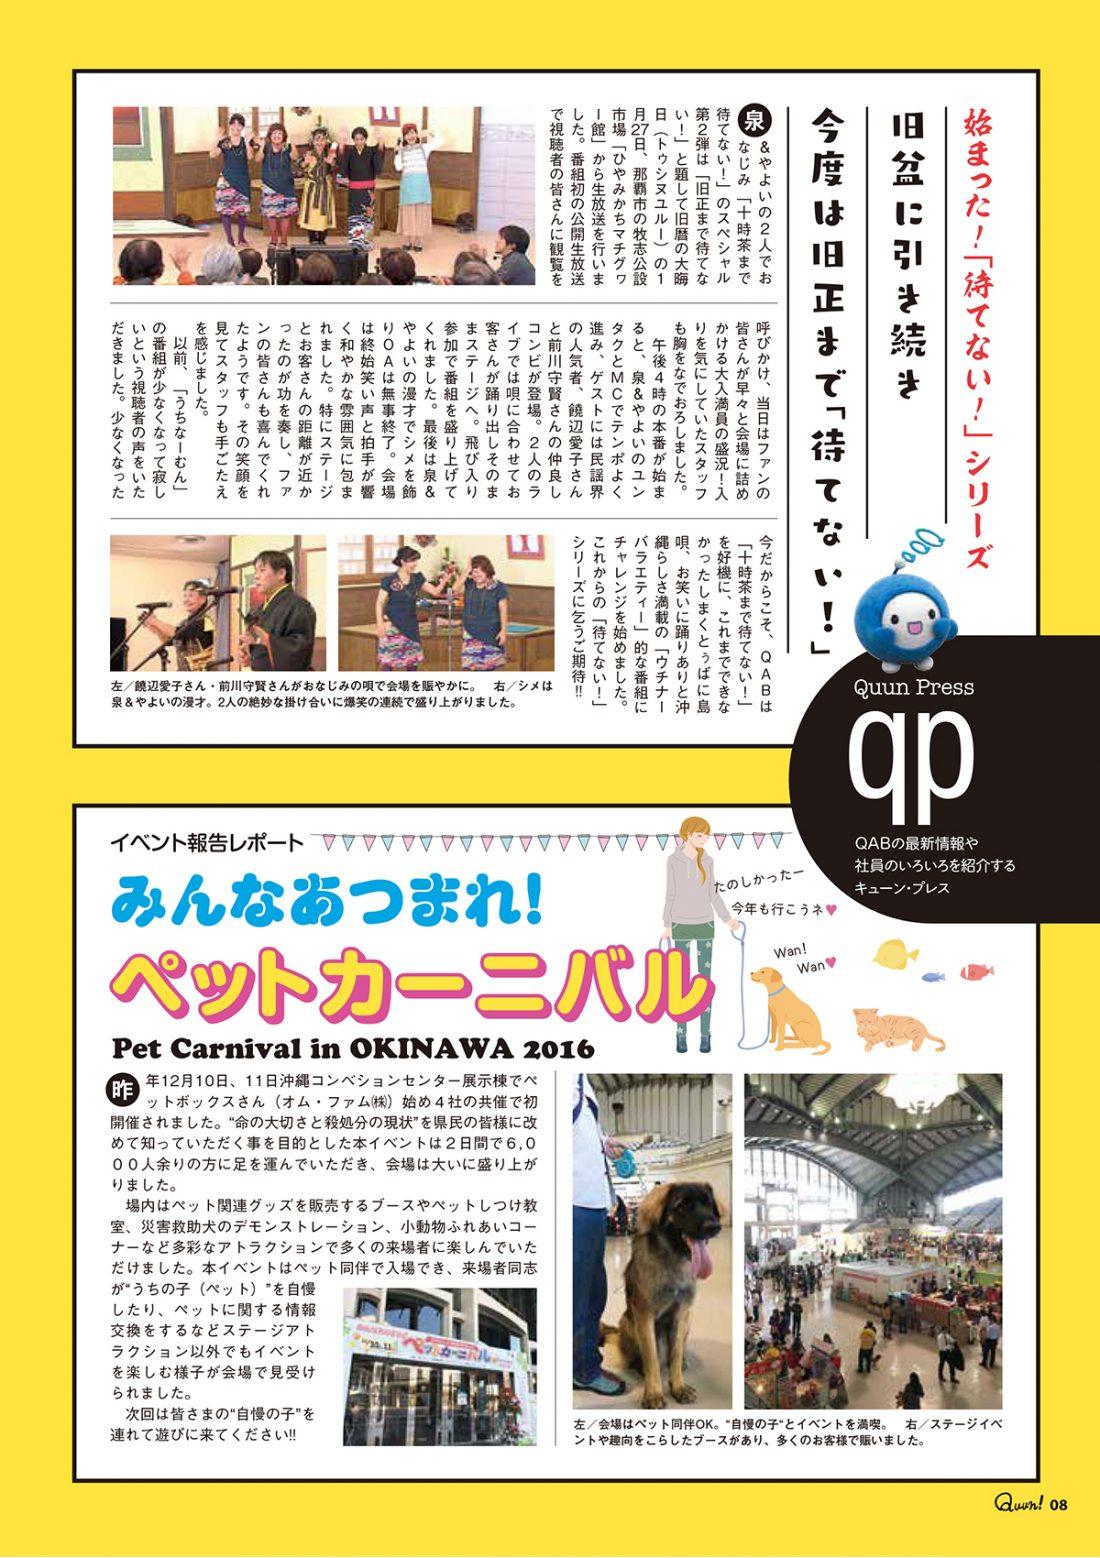 https://www.qab.co.jp/qgoro/wp-content/uploads/quun_0710-1100x1558.jpg